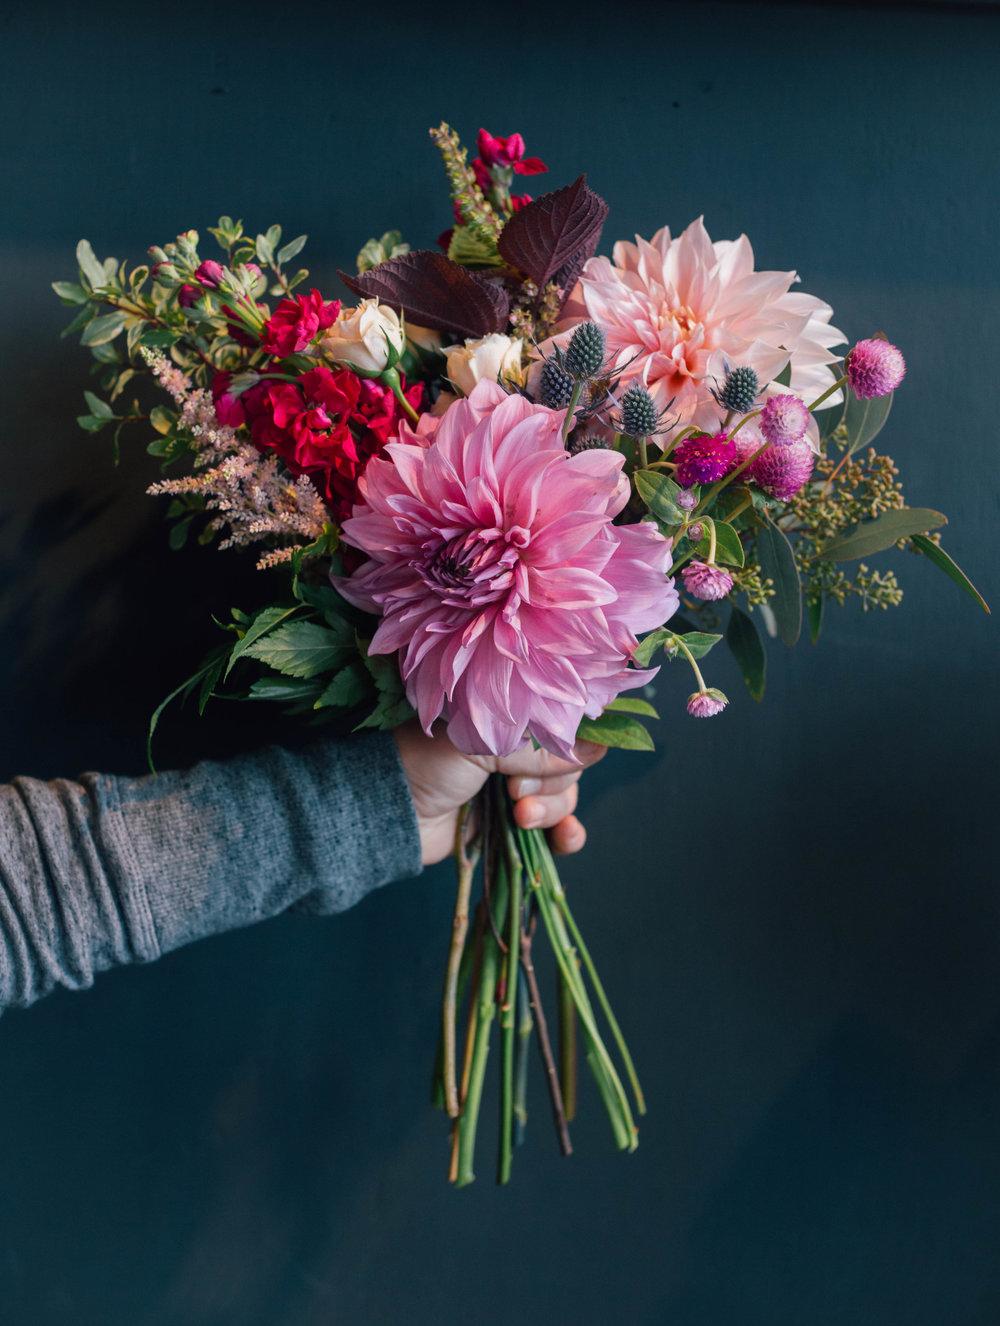 flower-furbish-subscription-club (1 of 3).jpg